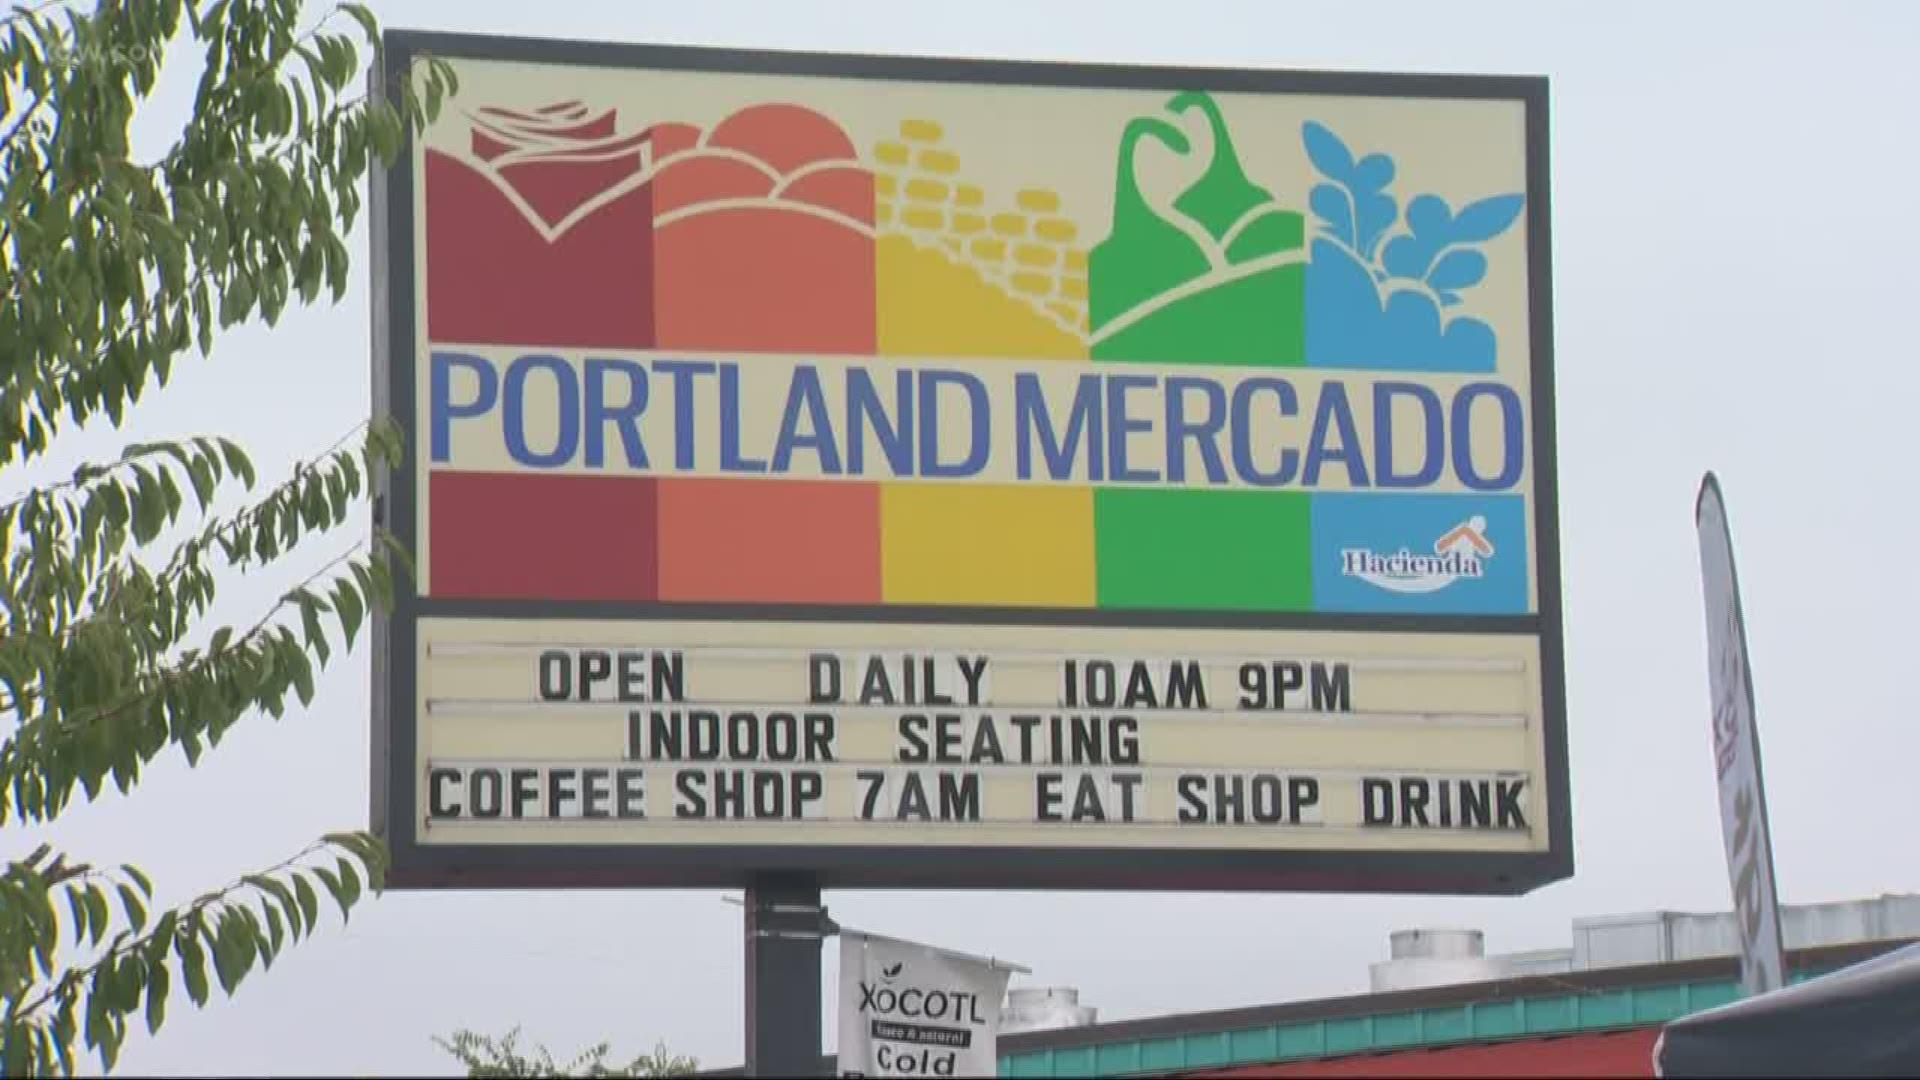 Portland Mercado hosts yearly festival days after break-in